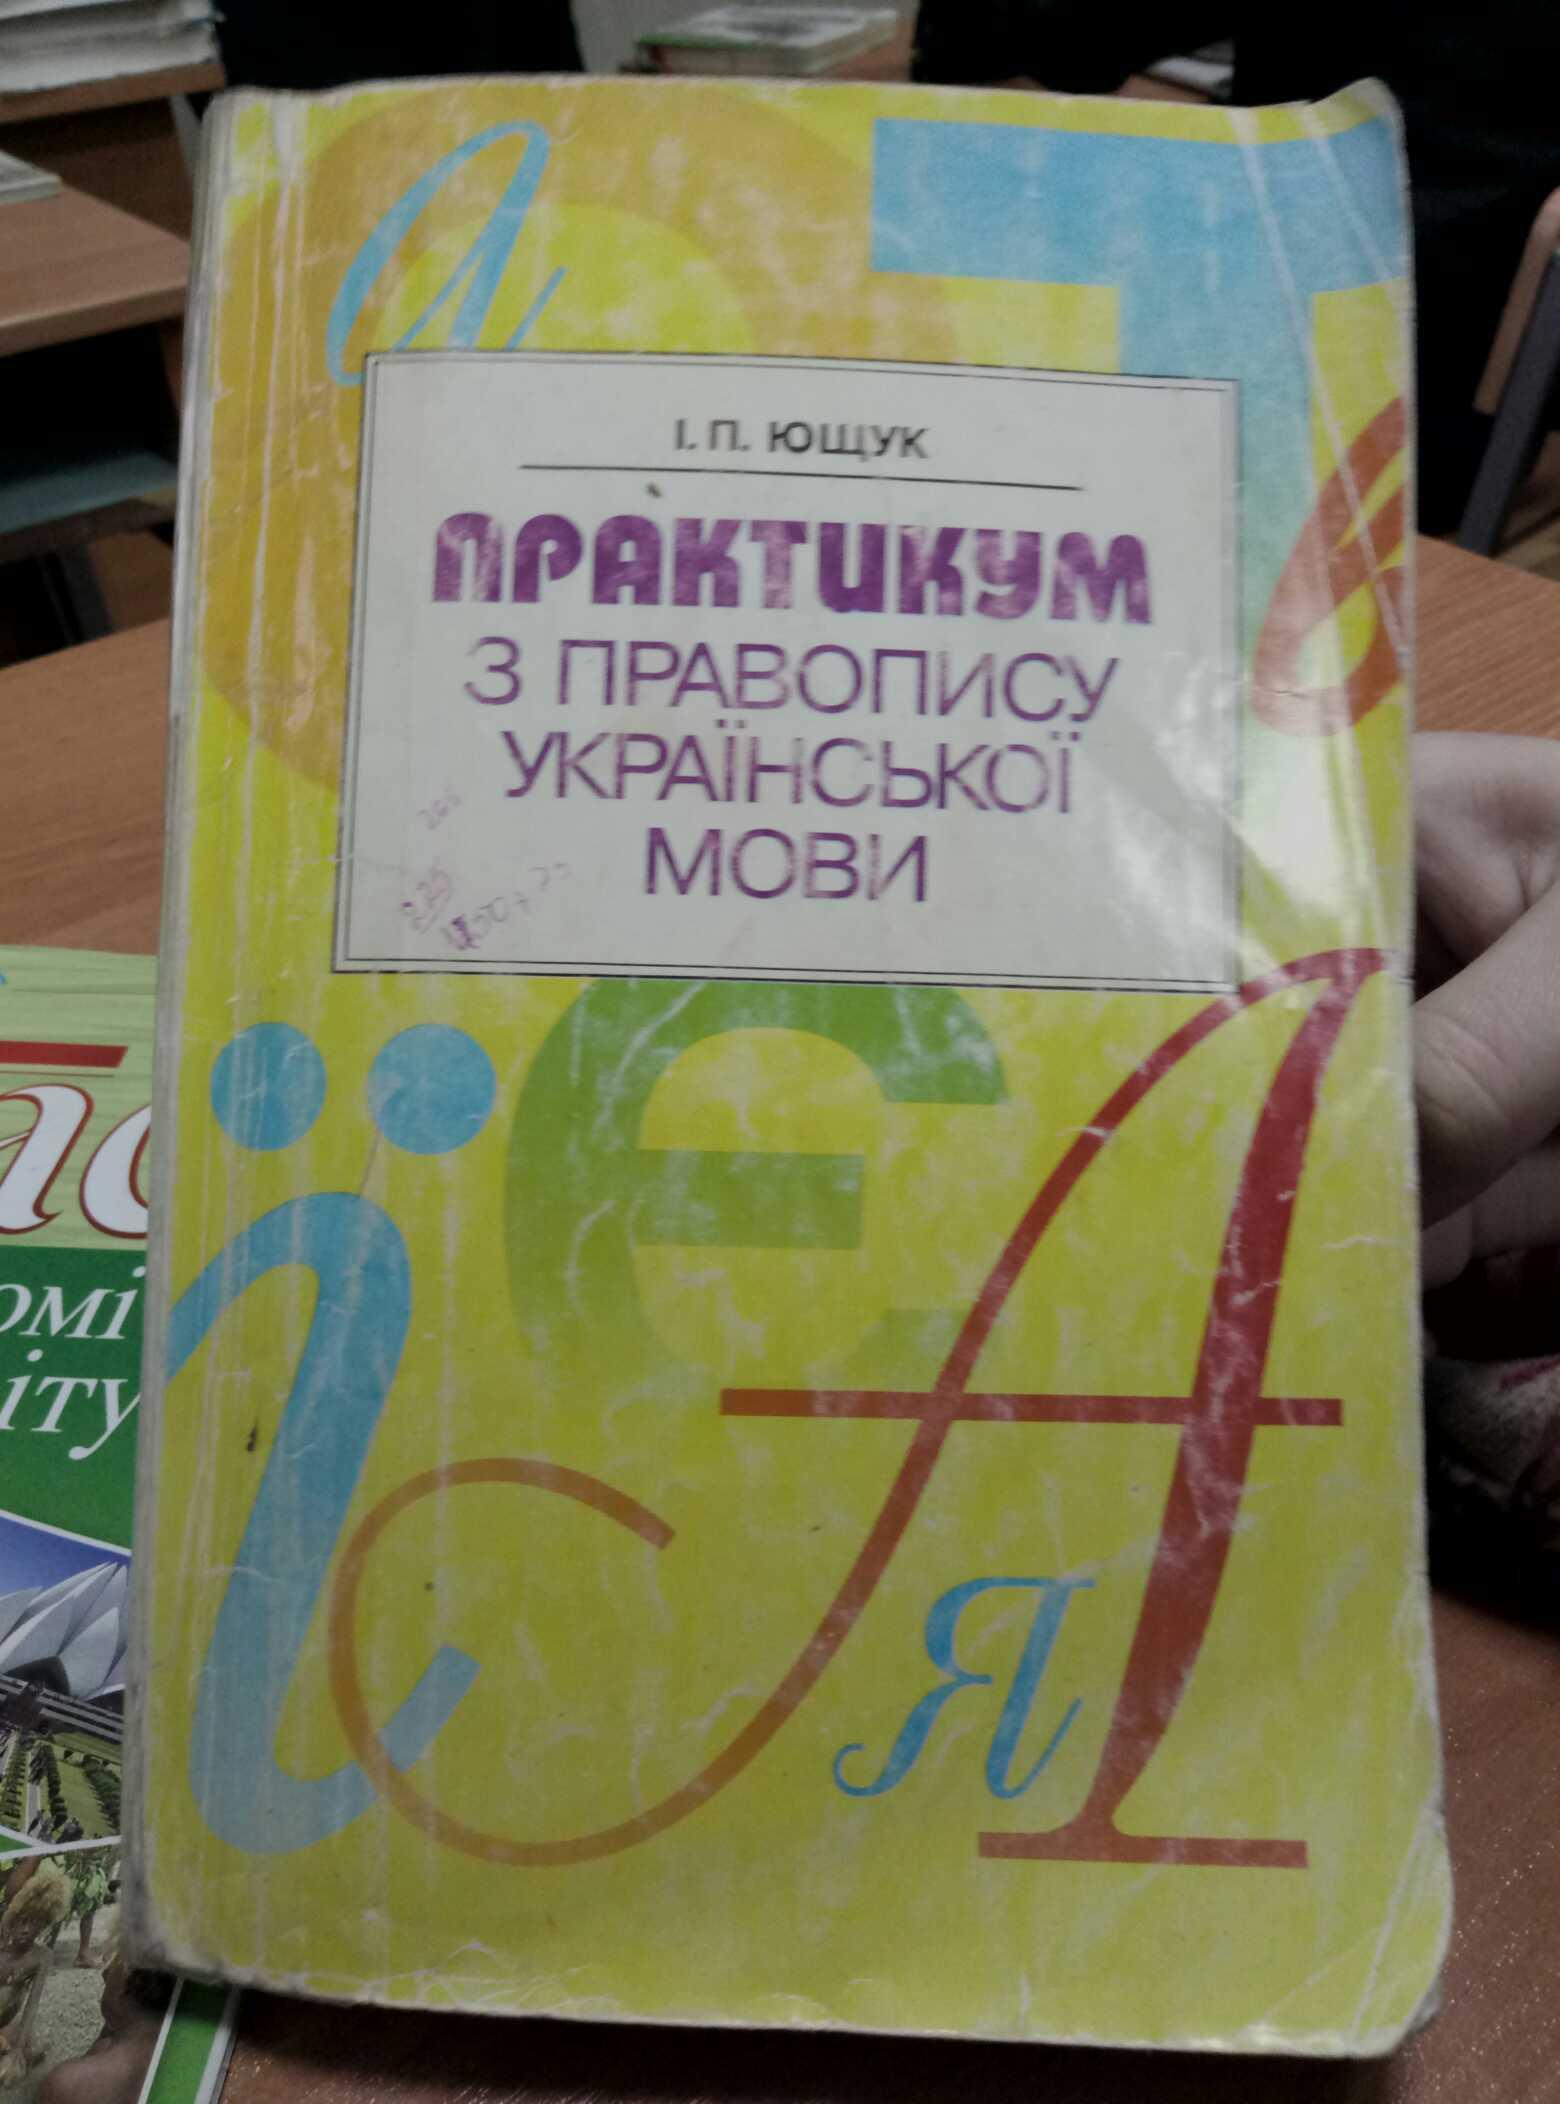 З правопису укрансько мови онлайн ющук практикум решебник